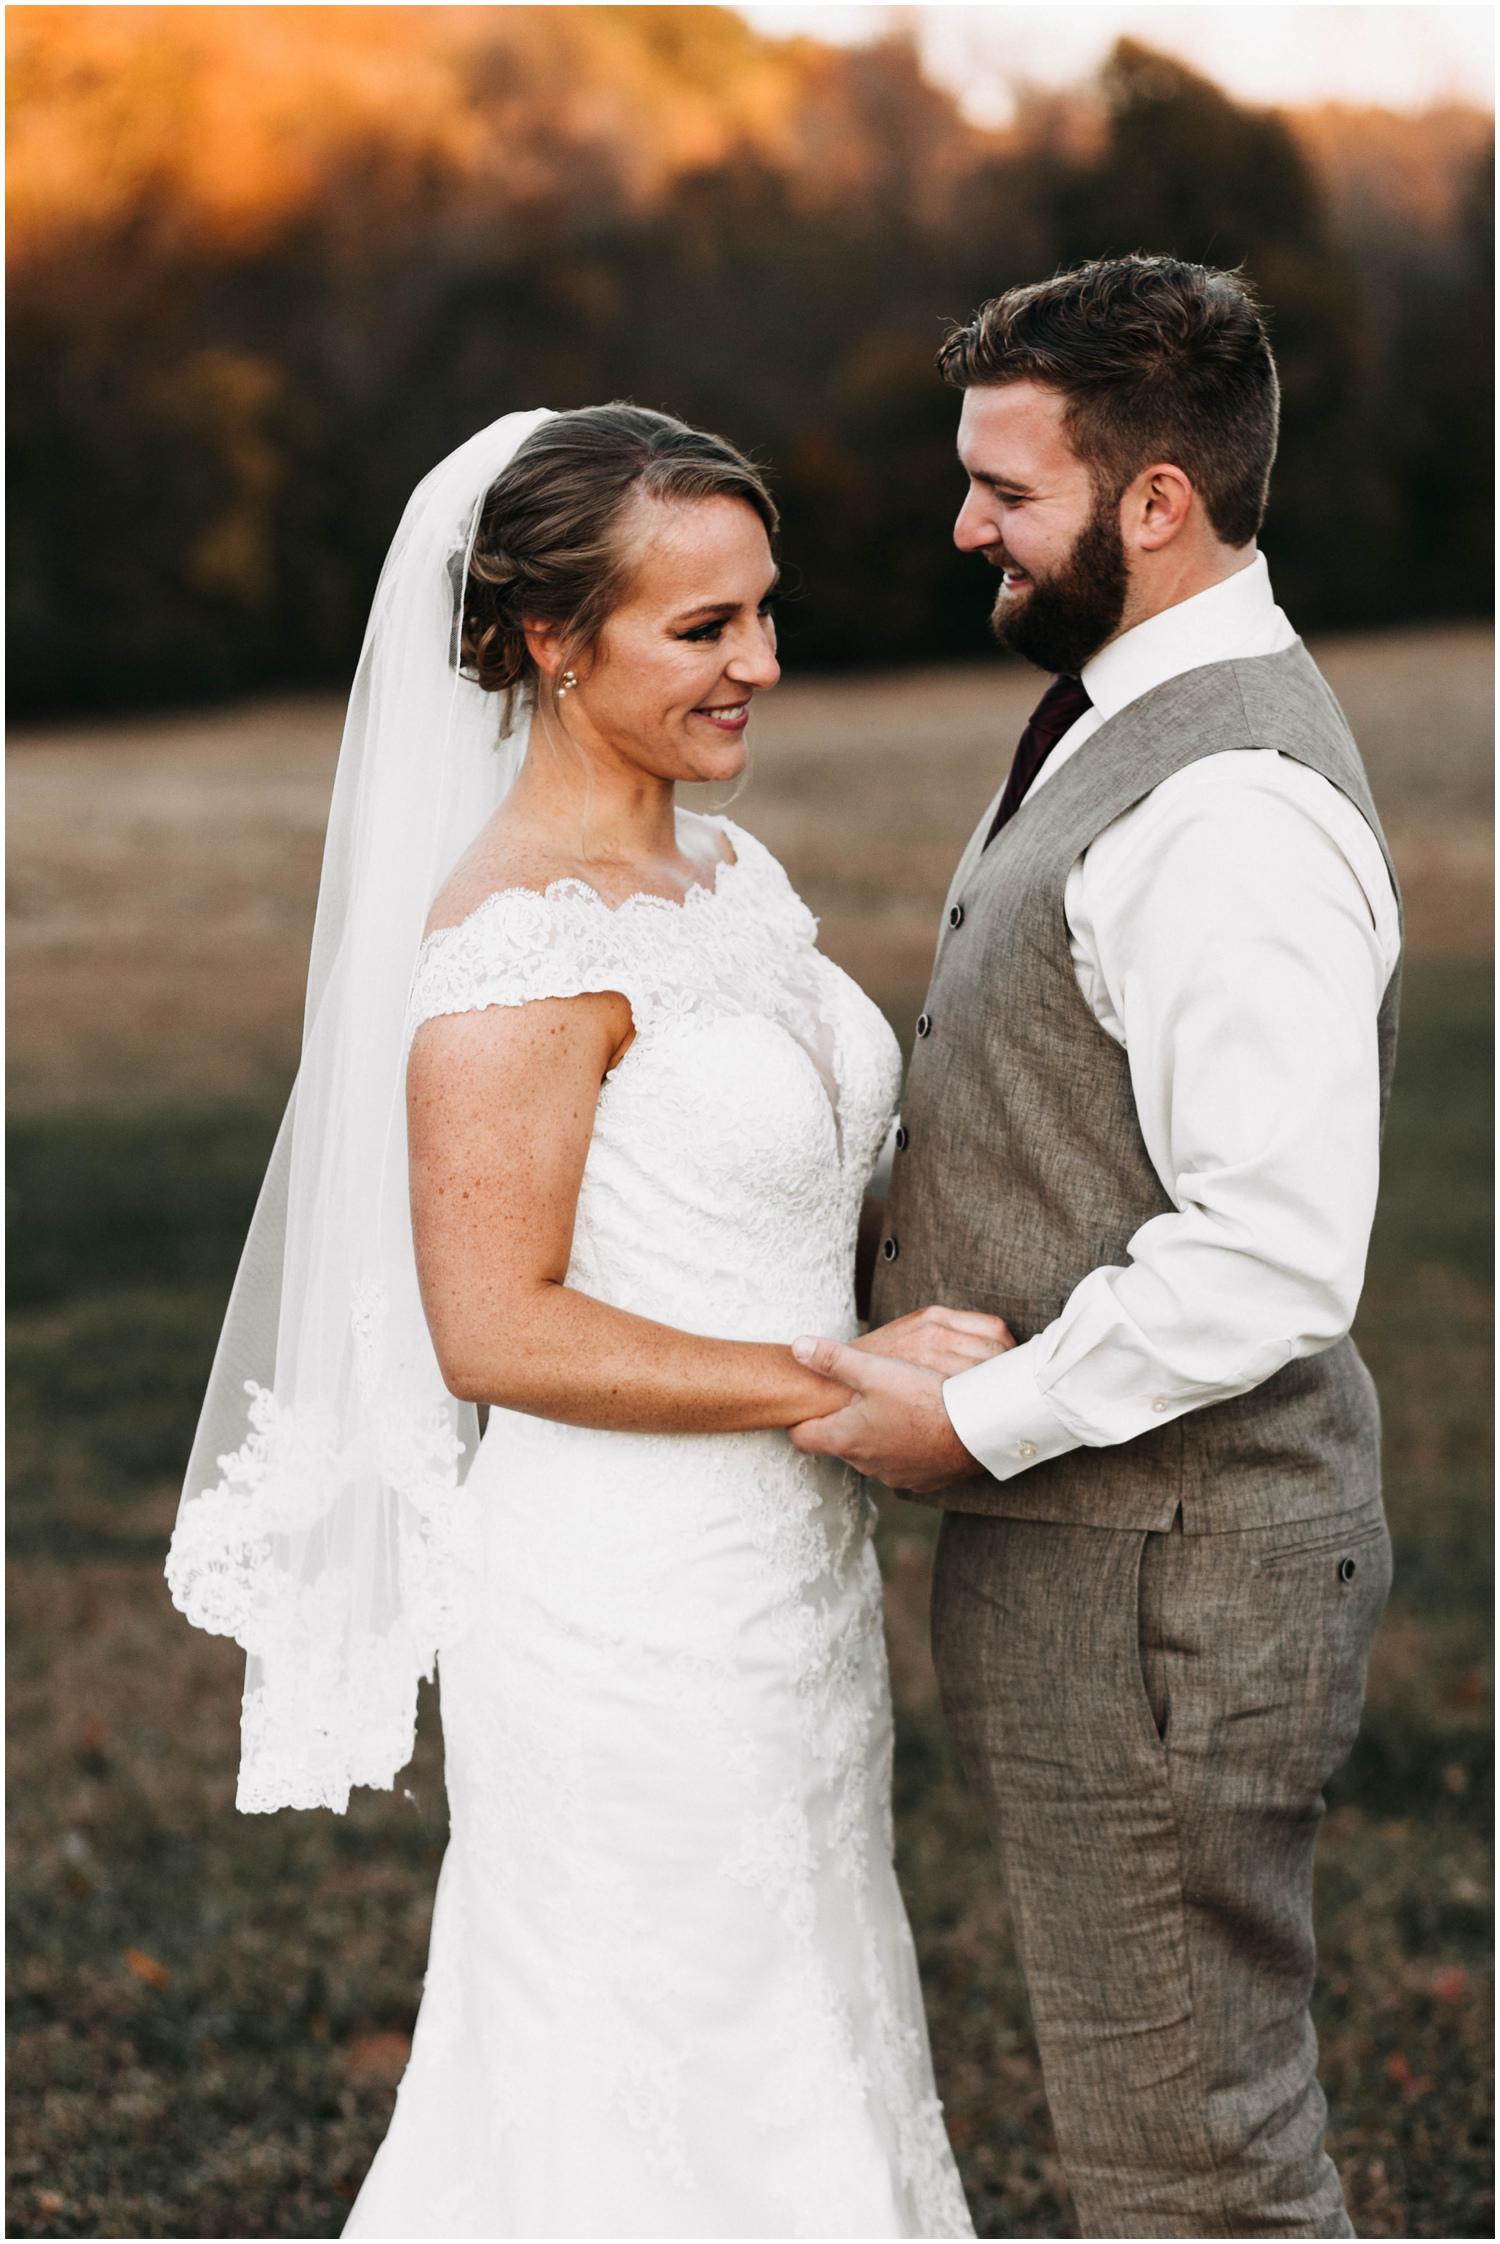 Jess+Dan_rustic_southern_farm_fall_wedding_charlotte_north carolina_taylor powers_0214.jpg